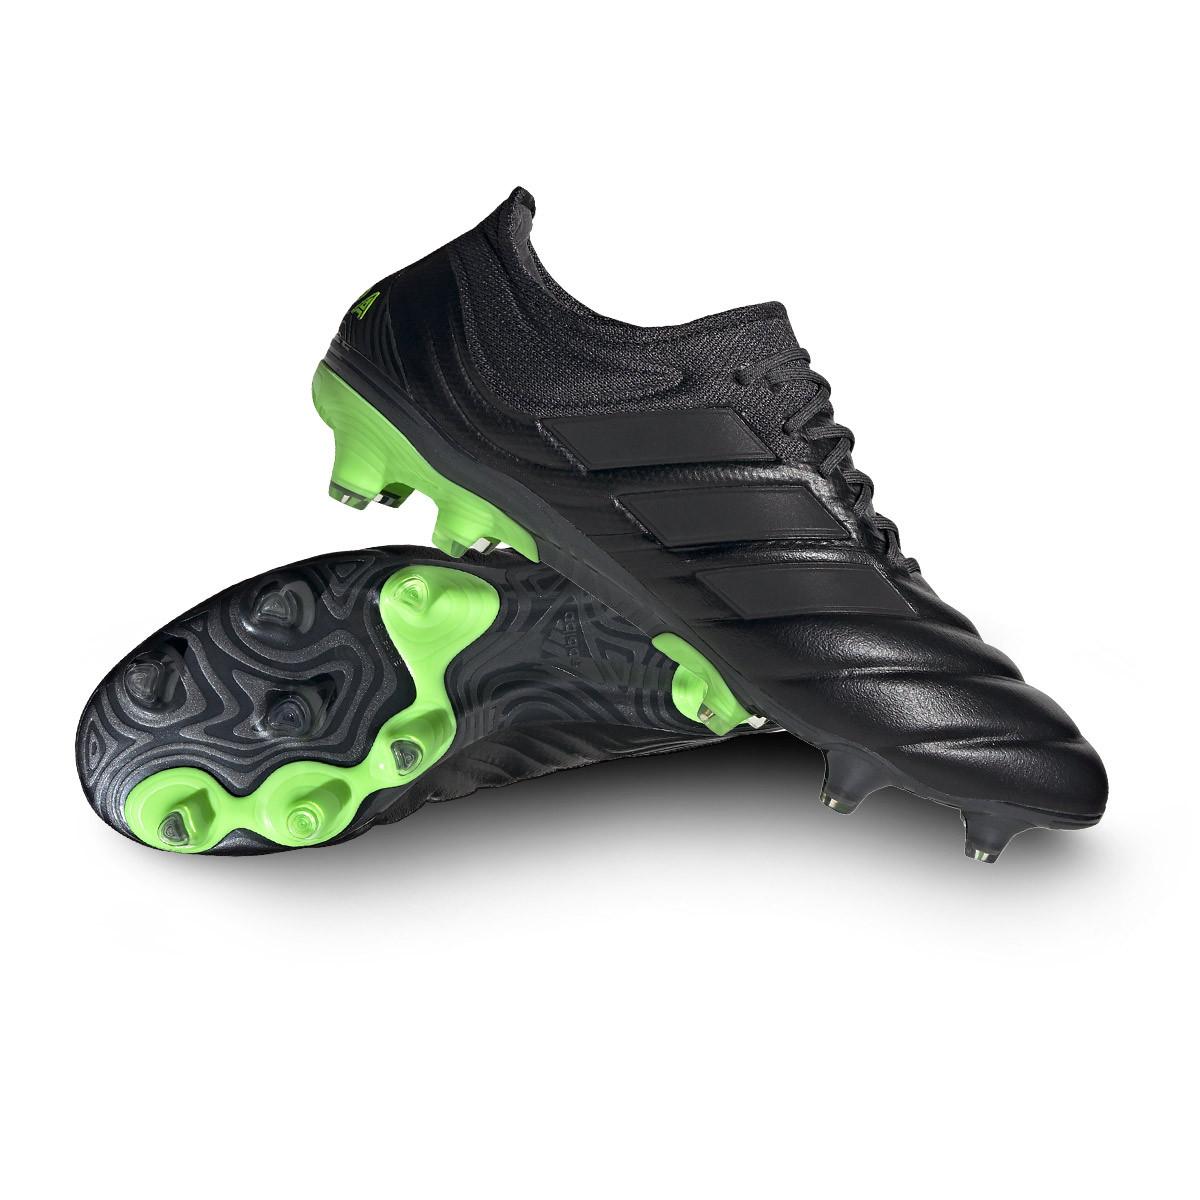 Electrizar gemelo Posibilidades  Bota de fútbol adidas Copa 20.1 FG Core black-Signal green - Tienda de fútbol  Fútbol Emotion